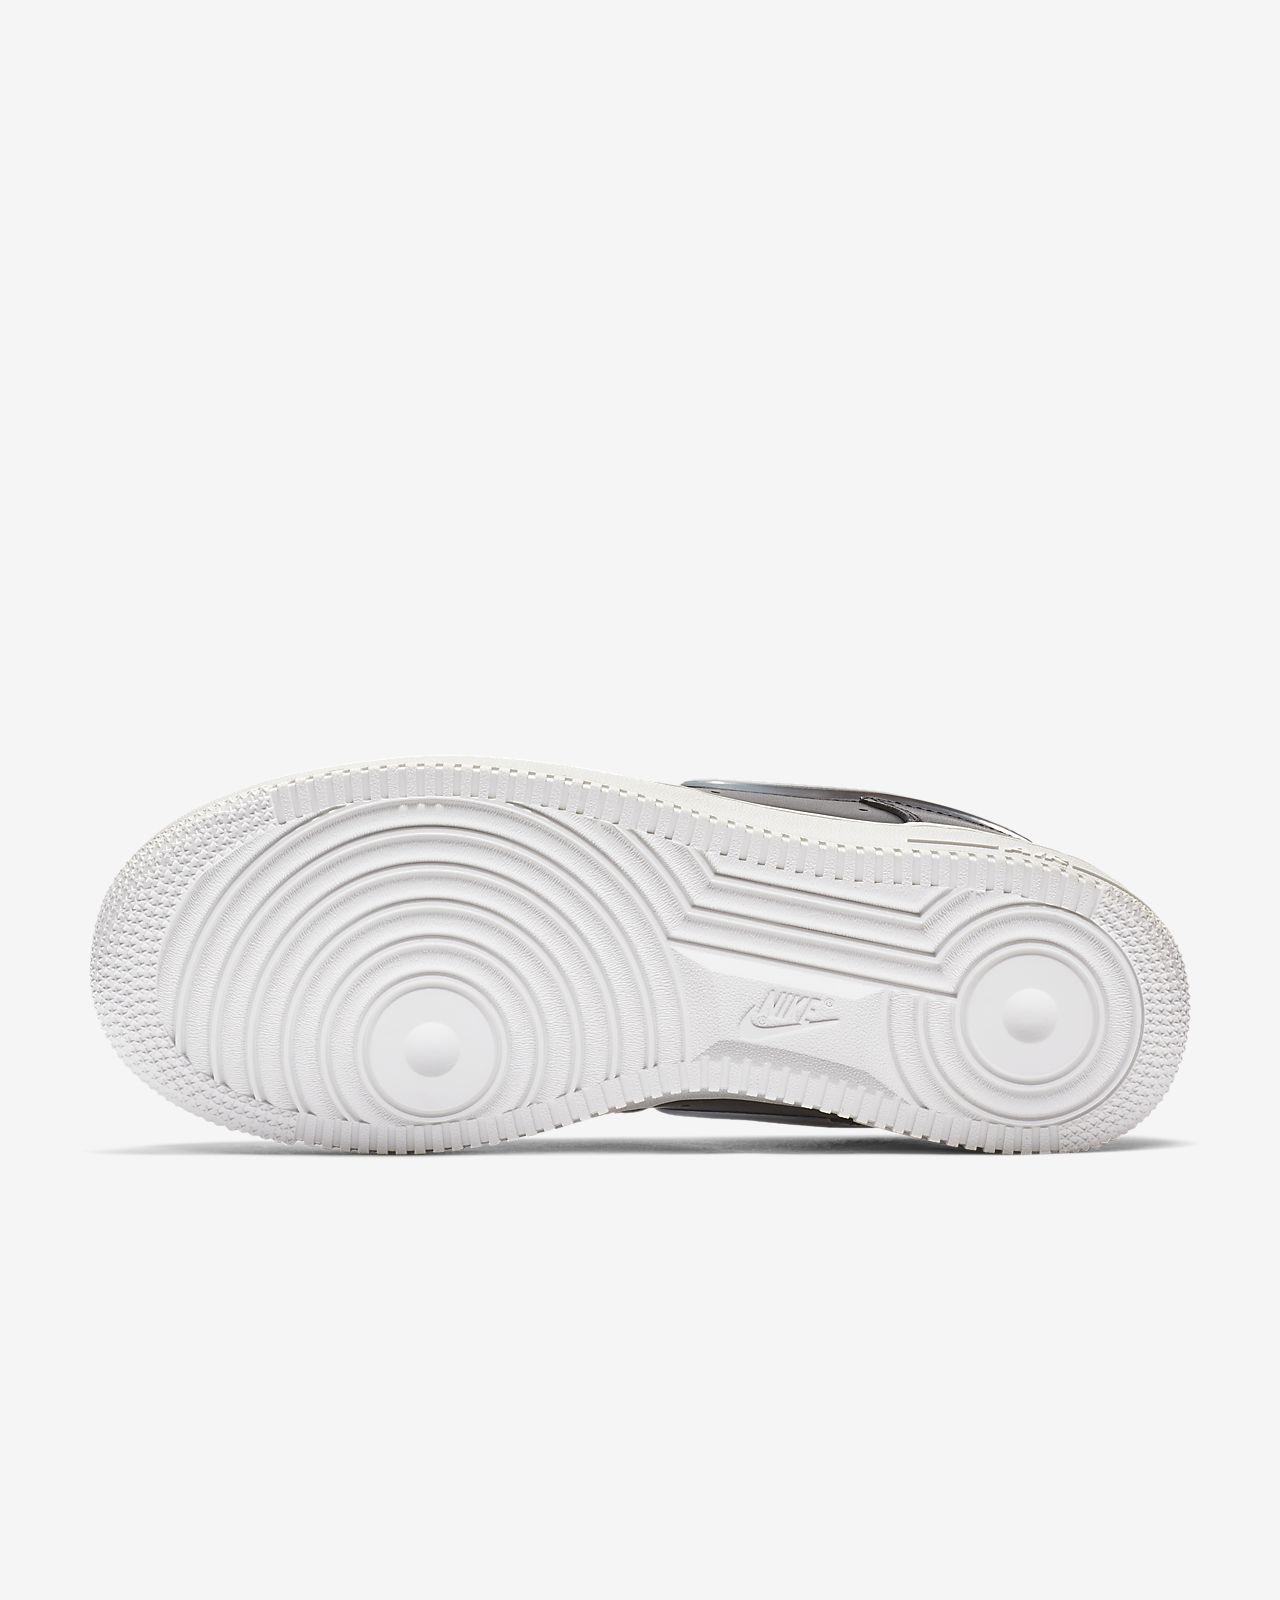 Nike Se FemmeFr 1 Premium Pour Air Force Chaussure '07 WEH29ID